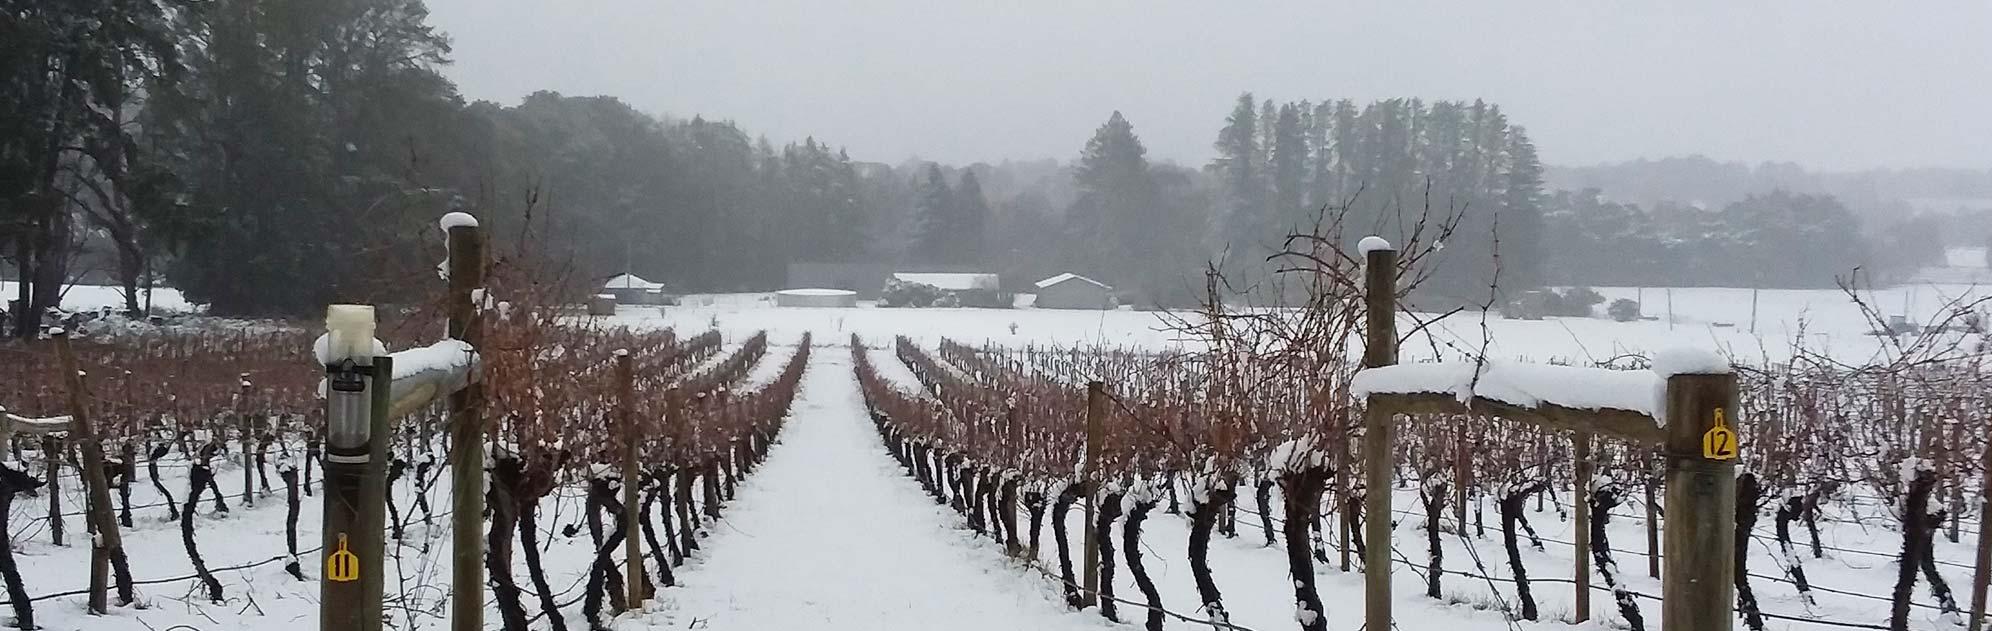 Snow covered vineyard